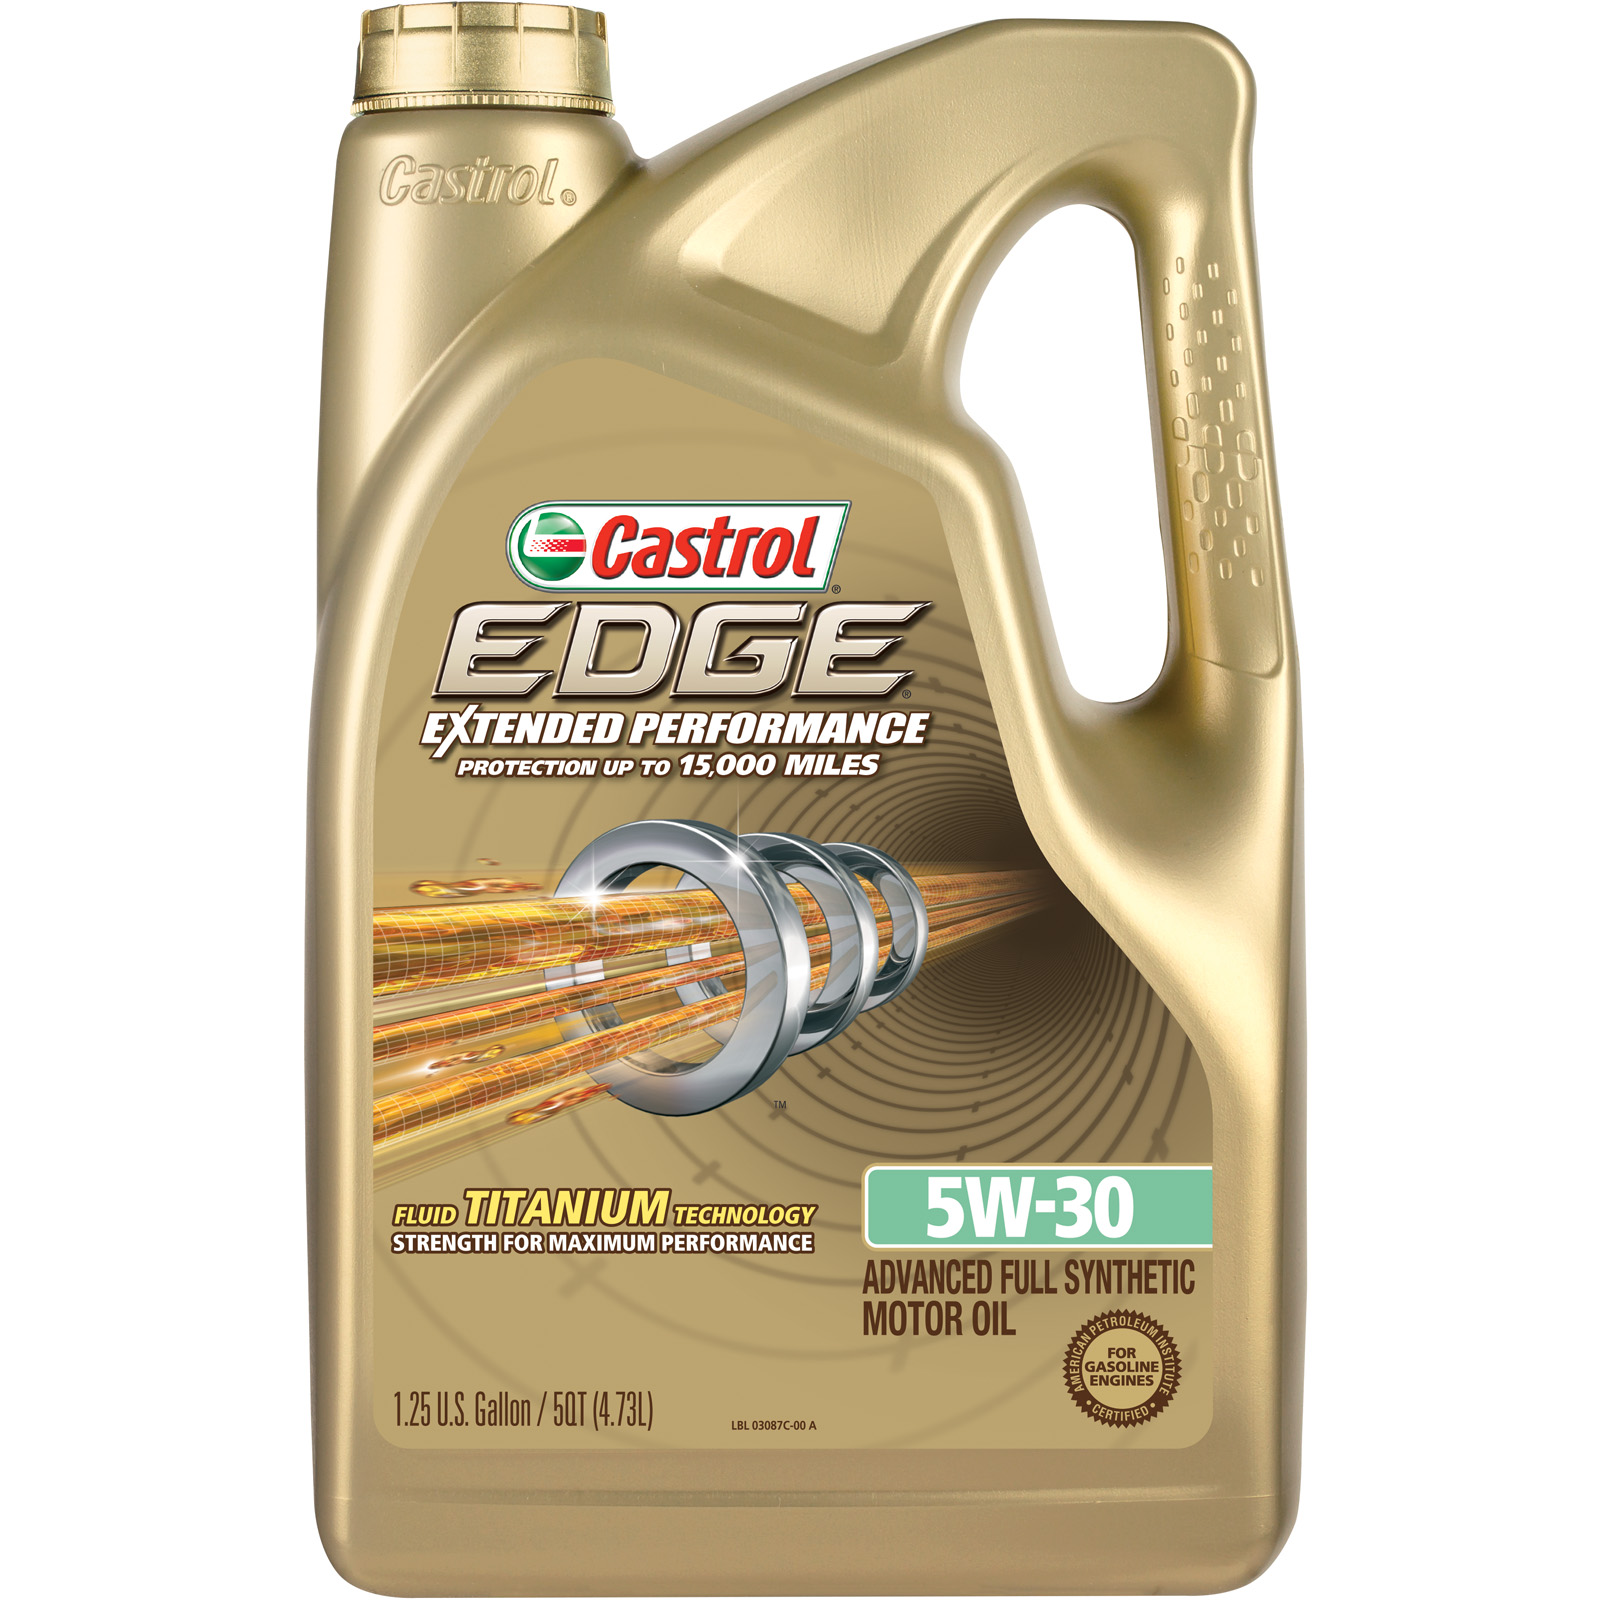 Castrol EDGE Extended Performance 5W-30 Advanced Full Synthetic Motor Oil, 5 QT